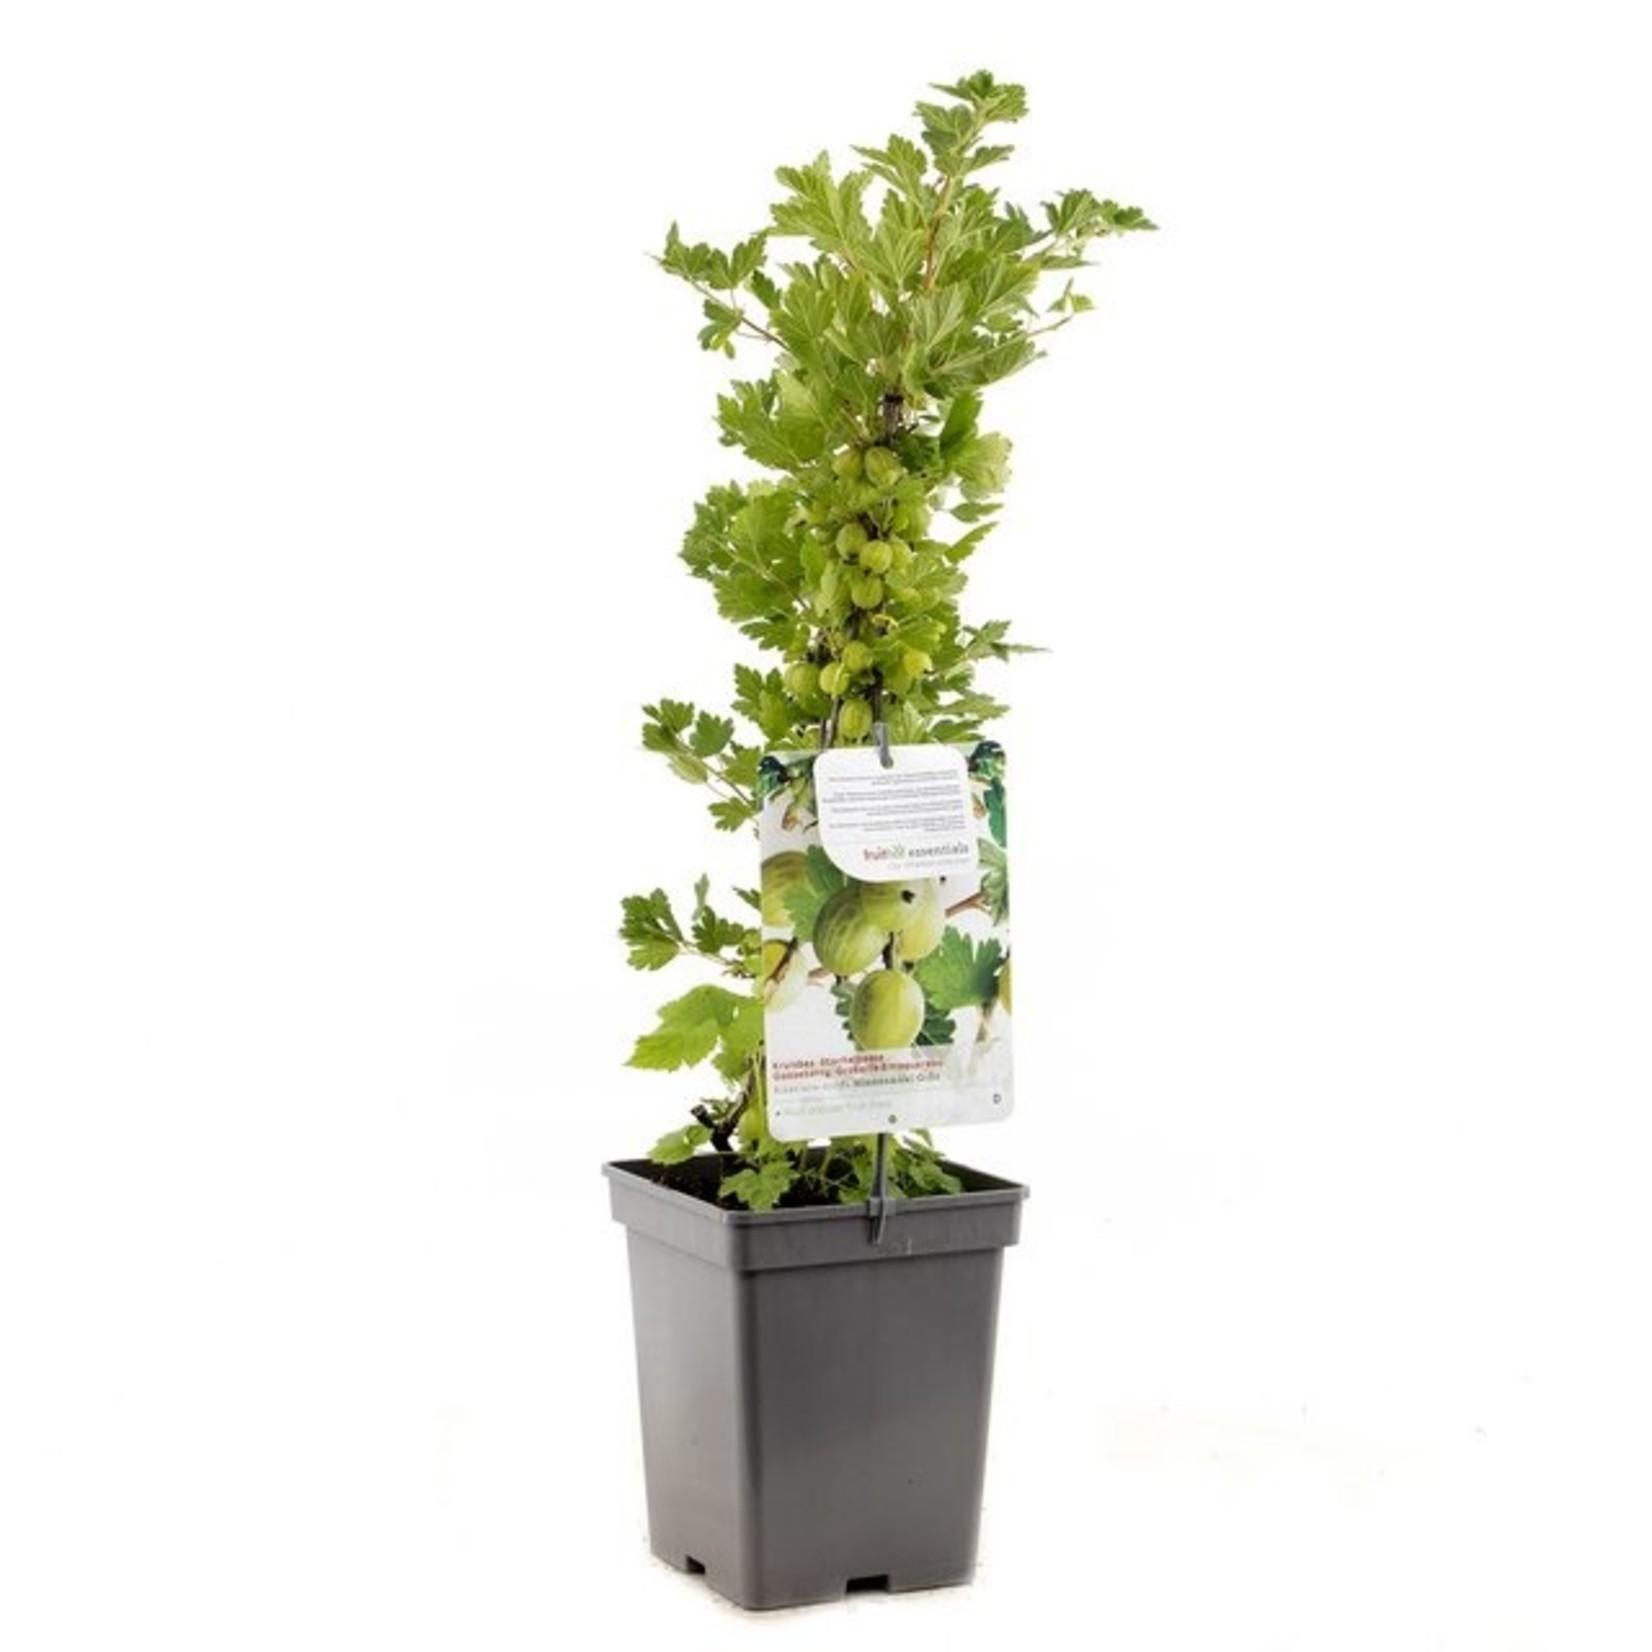 Ribes uva-crispa 'Hinnonmaki Grön' (groene kruisbes)